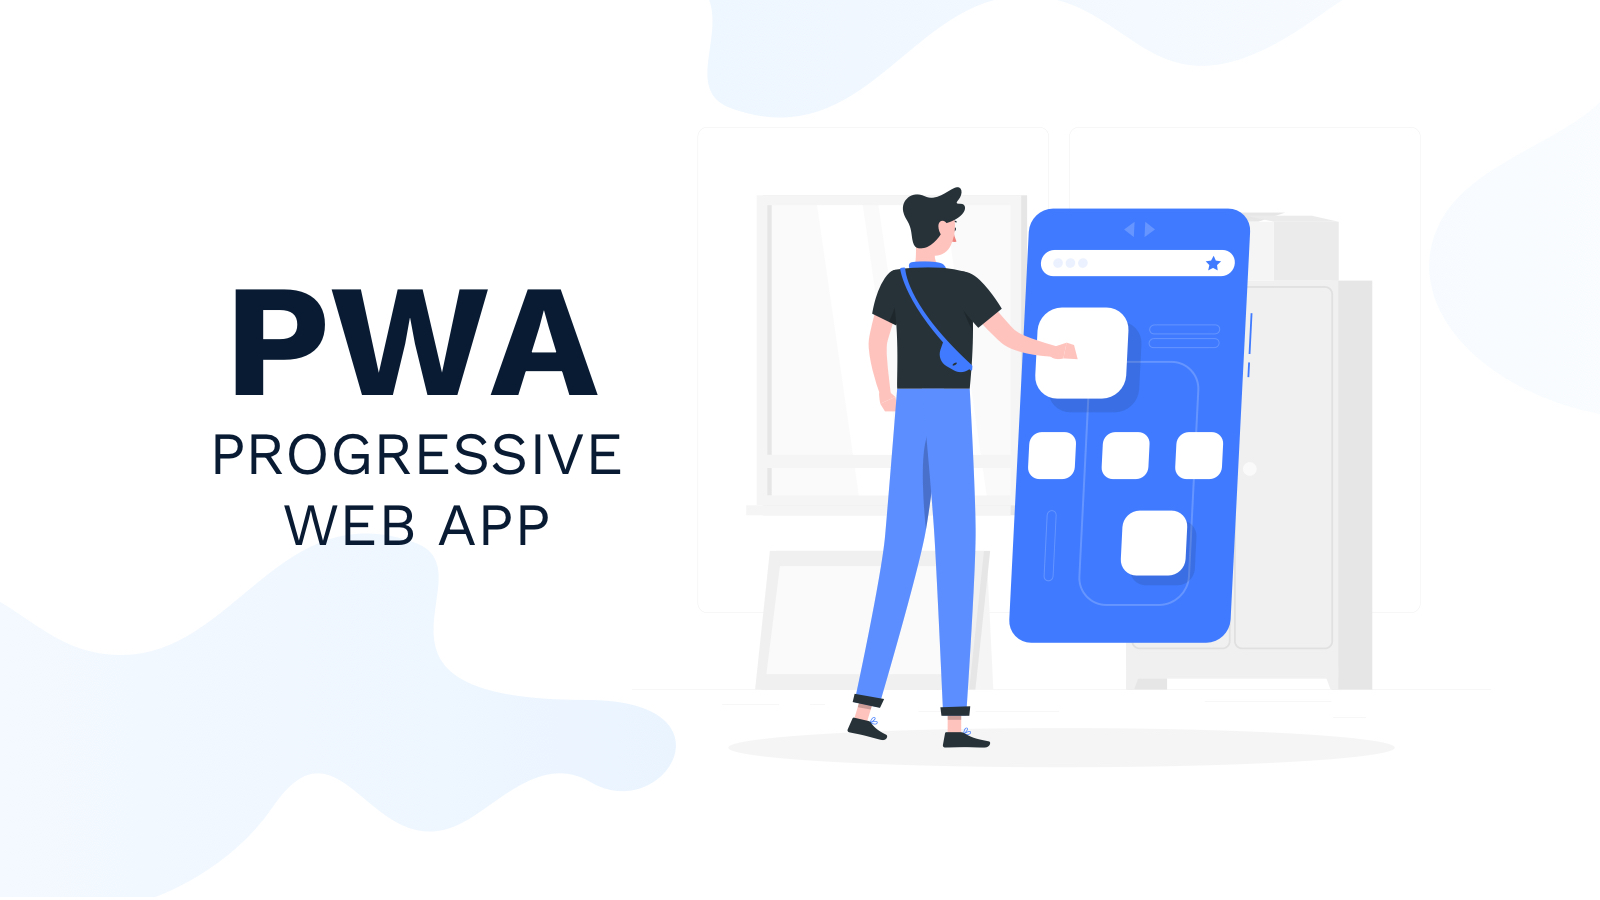 Progressive Wep App PWA — chuẩn mực web tương lai